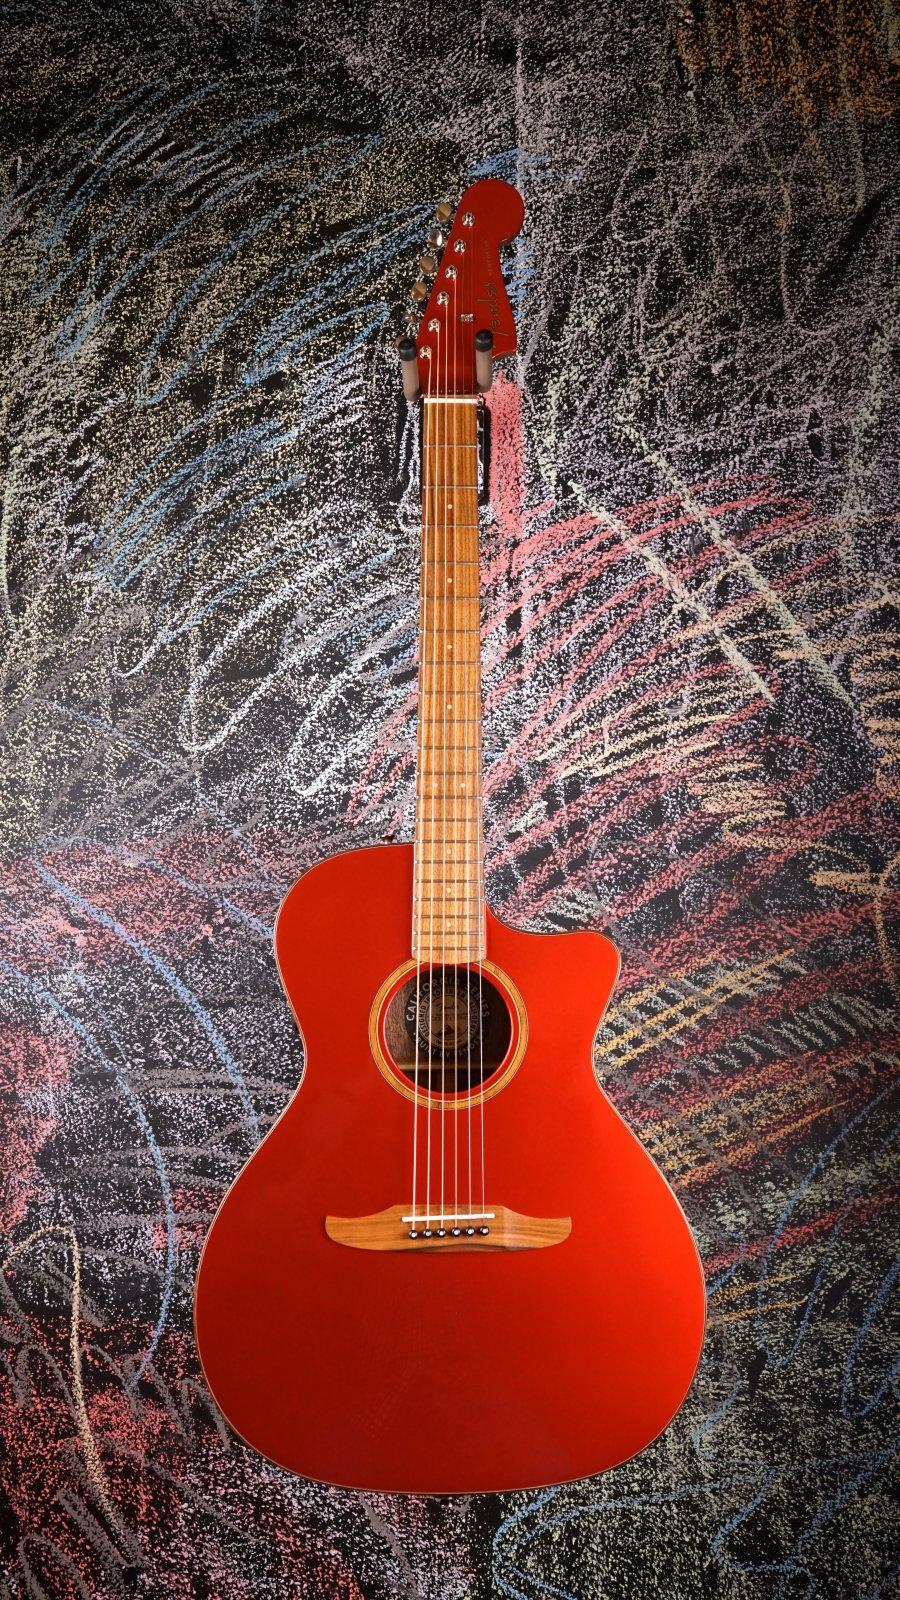 USED Fender Newporter Classic HRM w/ Fender Padded Gig Bag